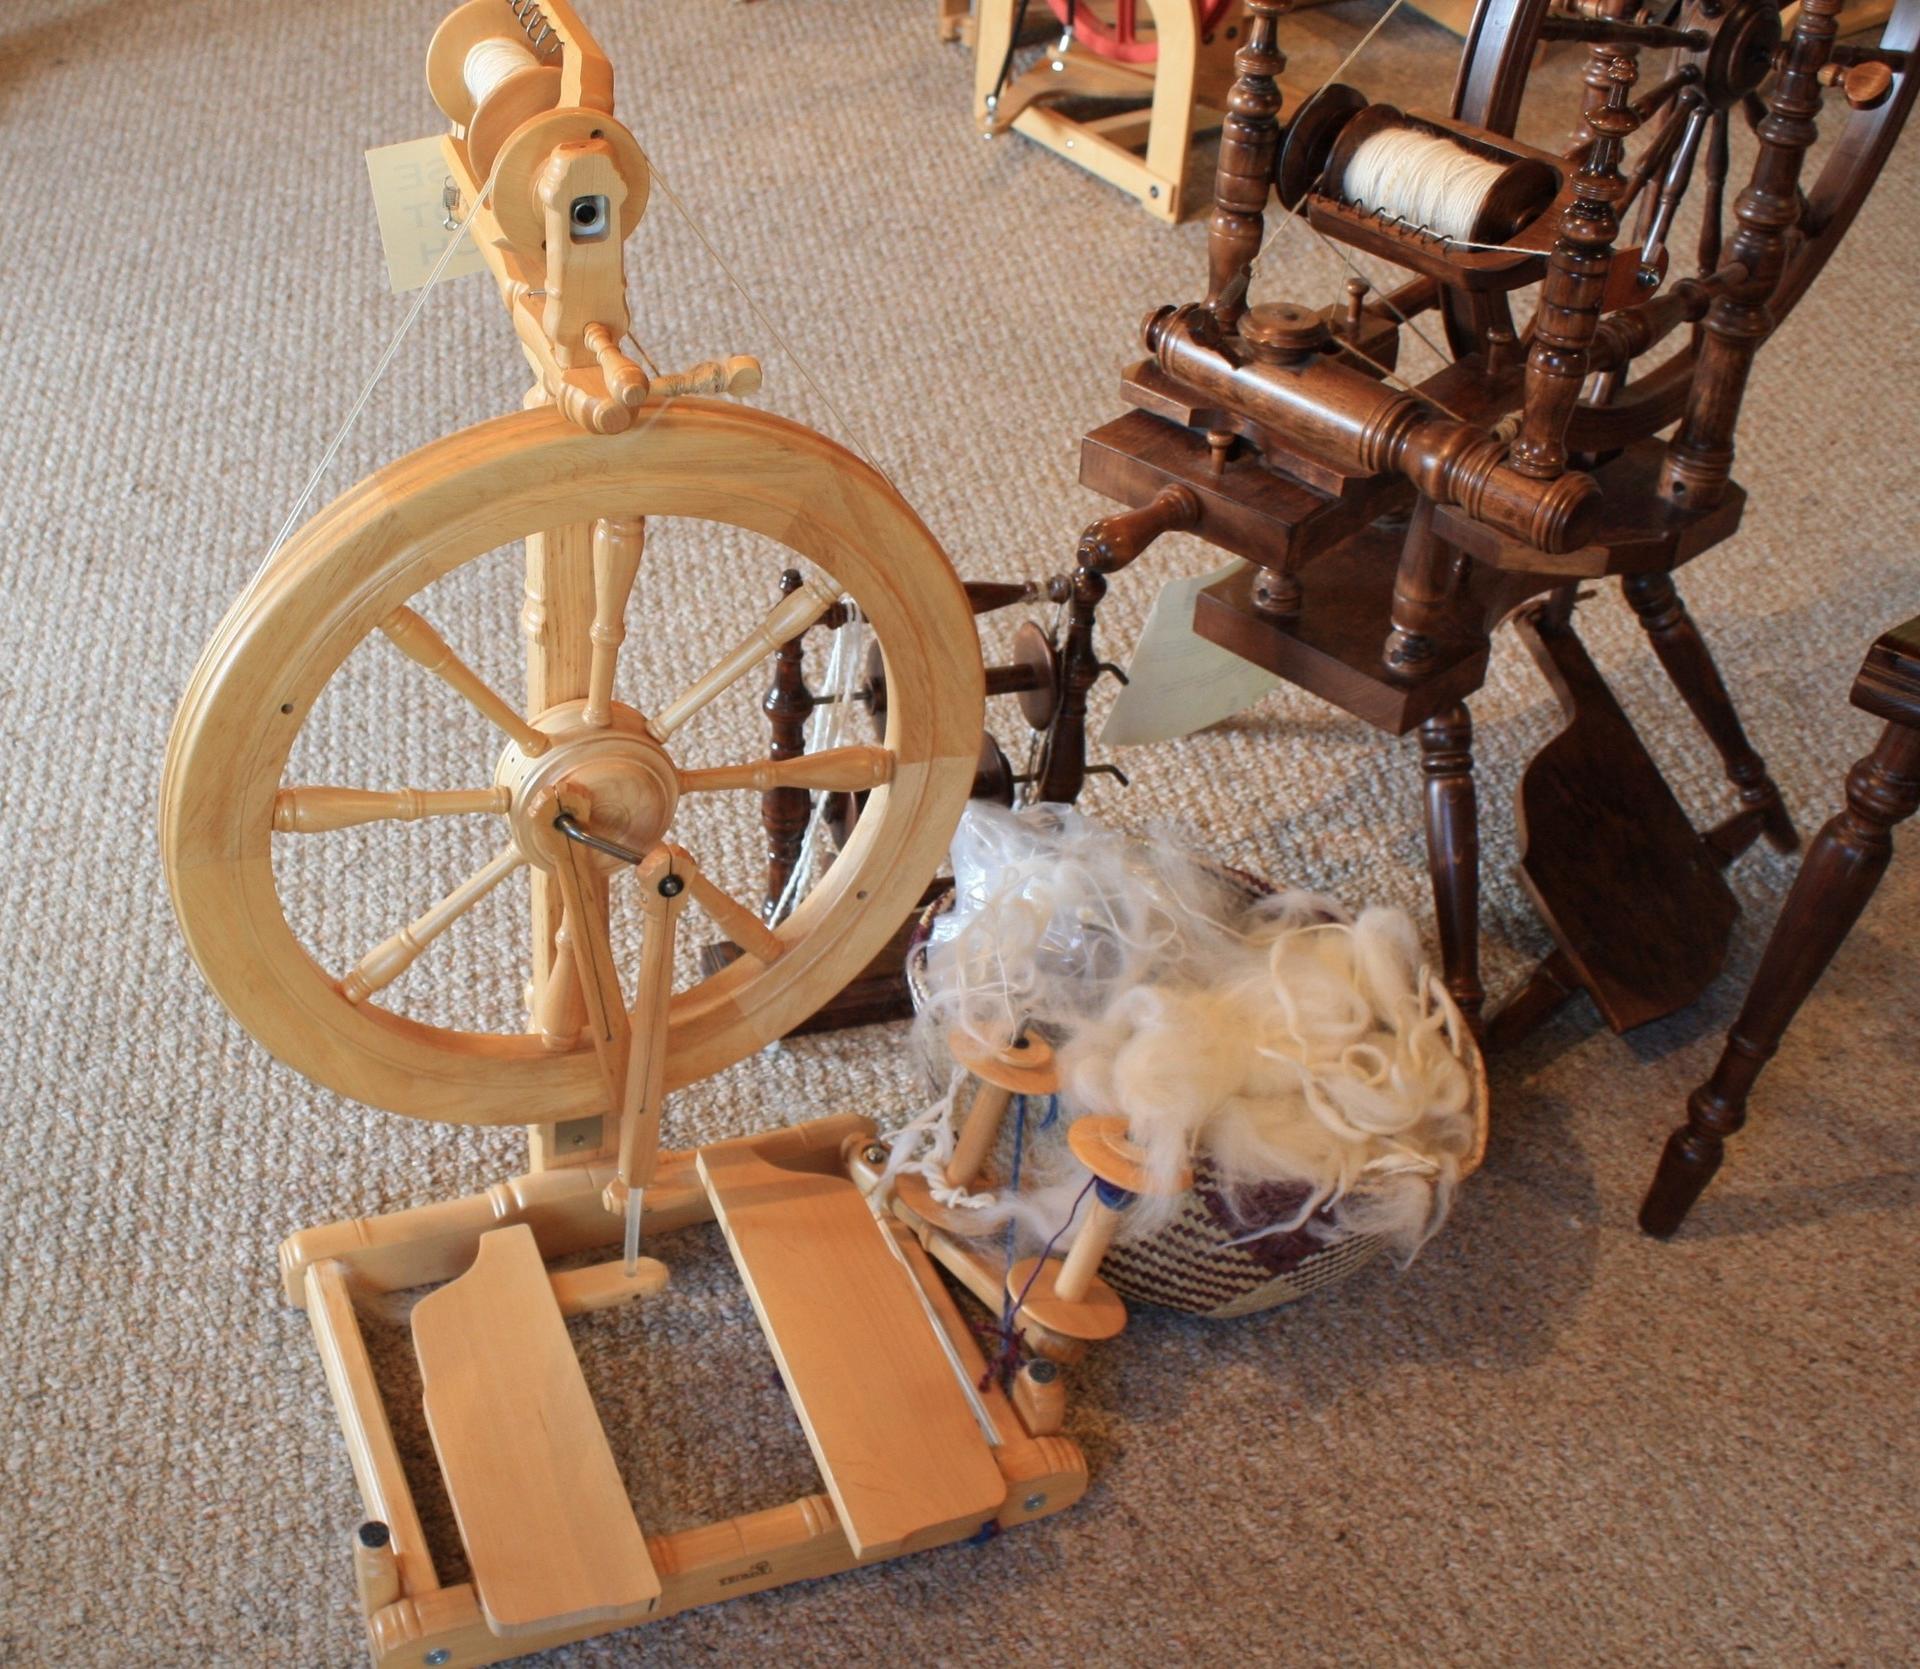 Inside the yarn shop